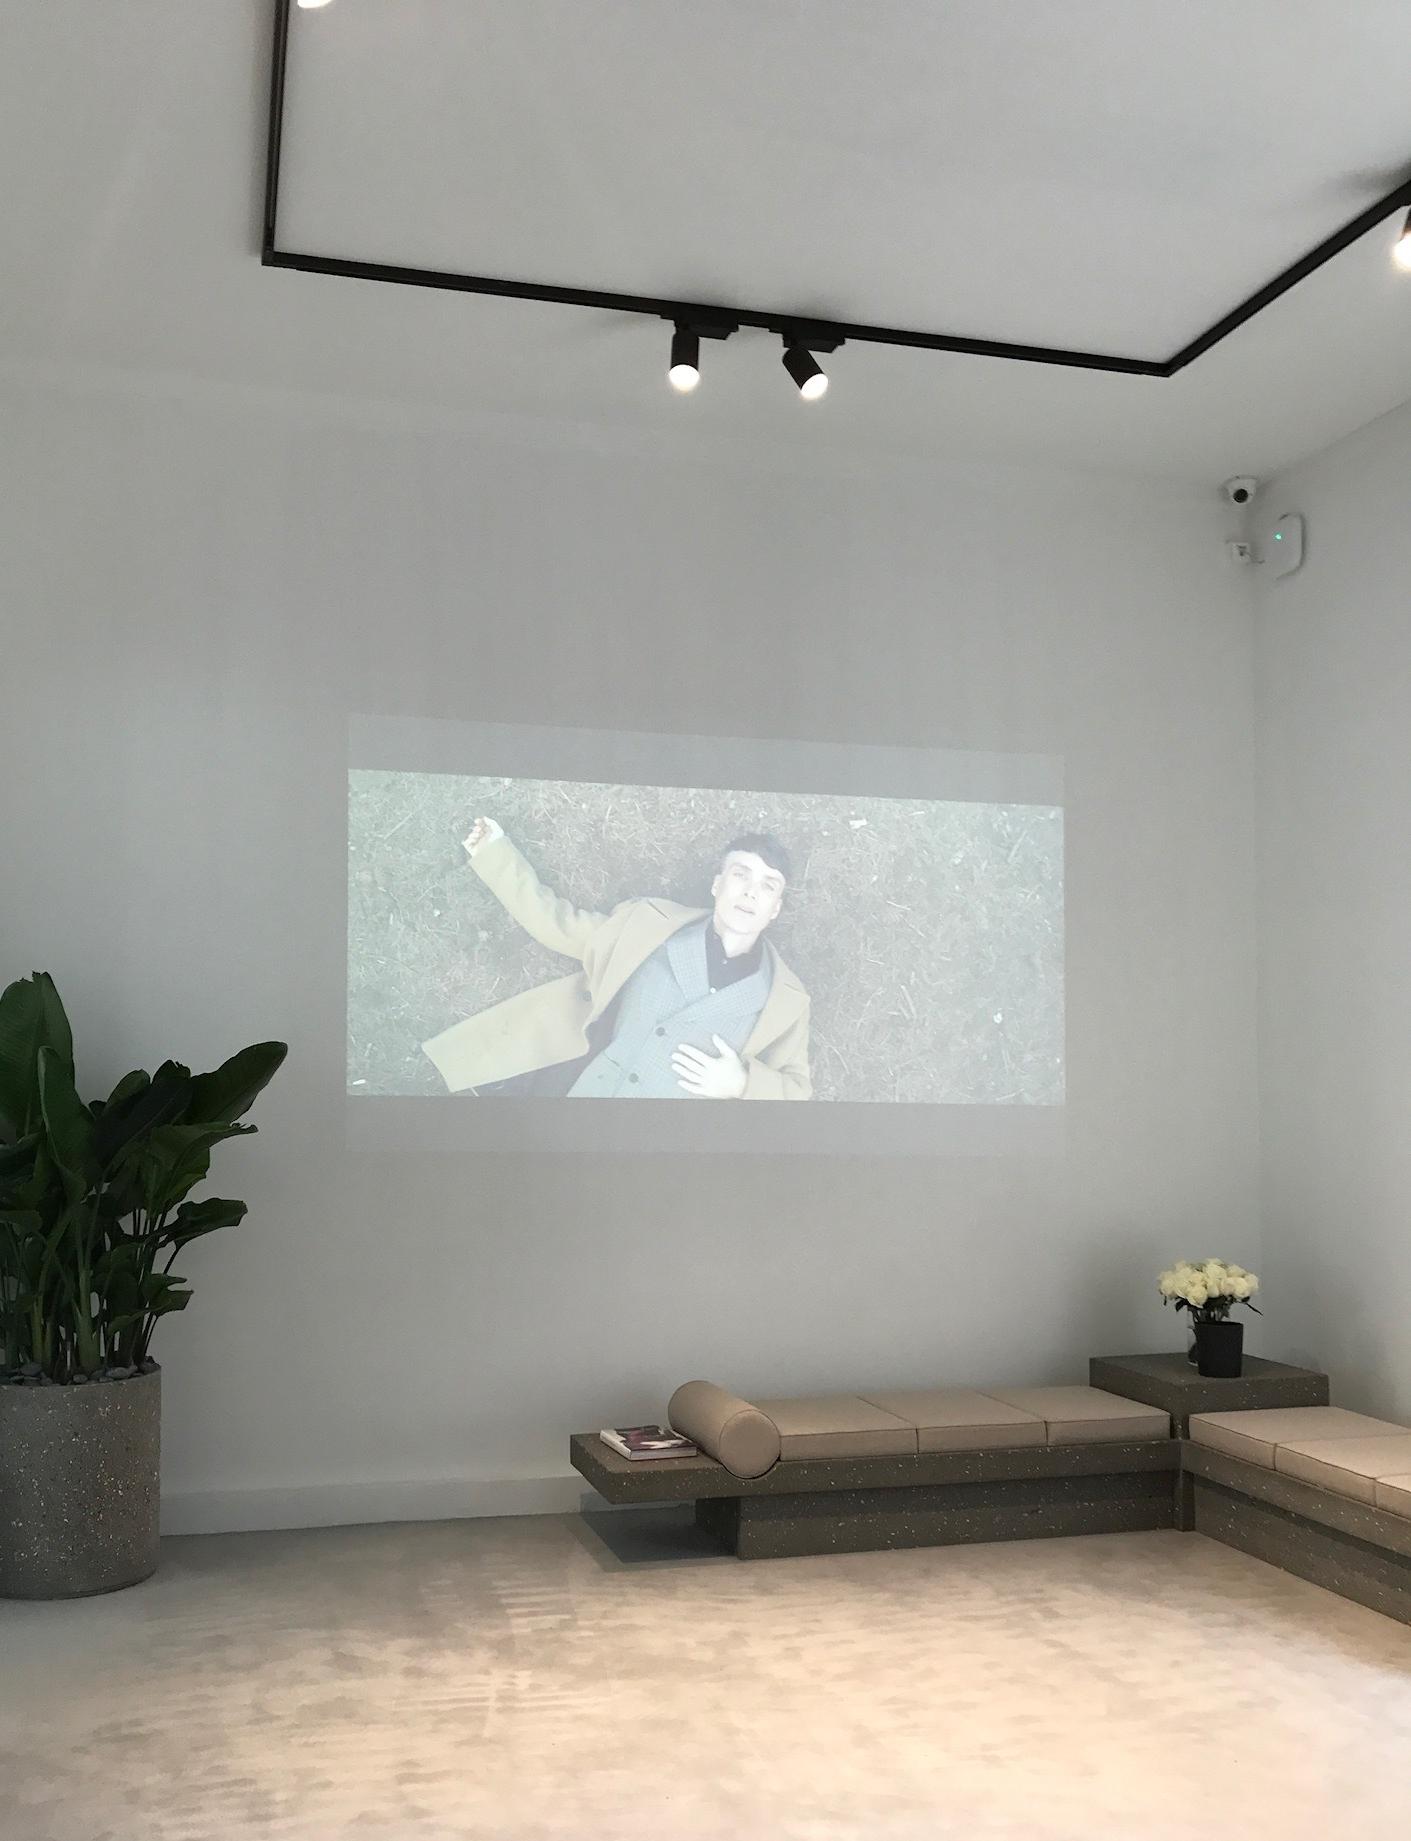 Stella McCartney Mens showroom - starring Cillian Murphy